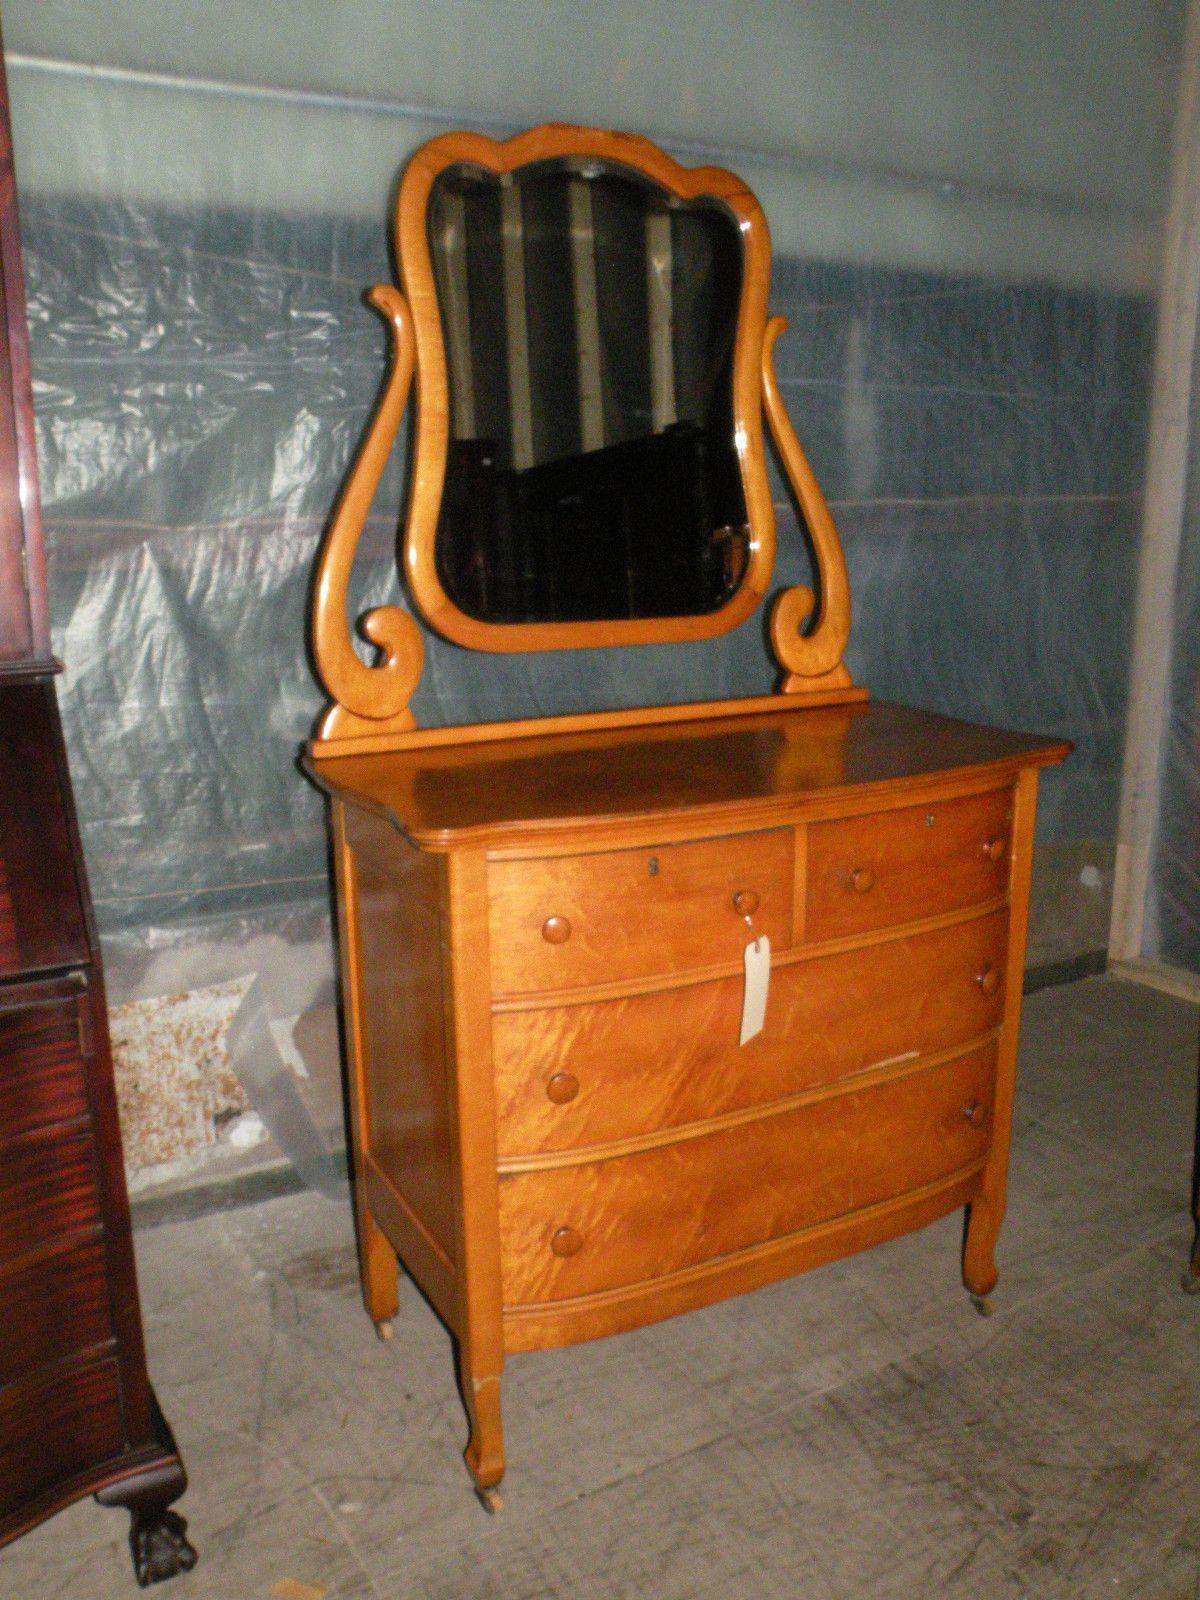 bedroom chair on ebay best chairs recliner antique rare birdseye maple dresser with mirror